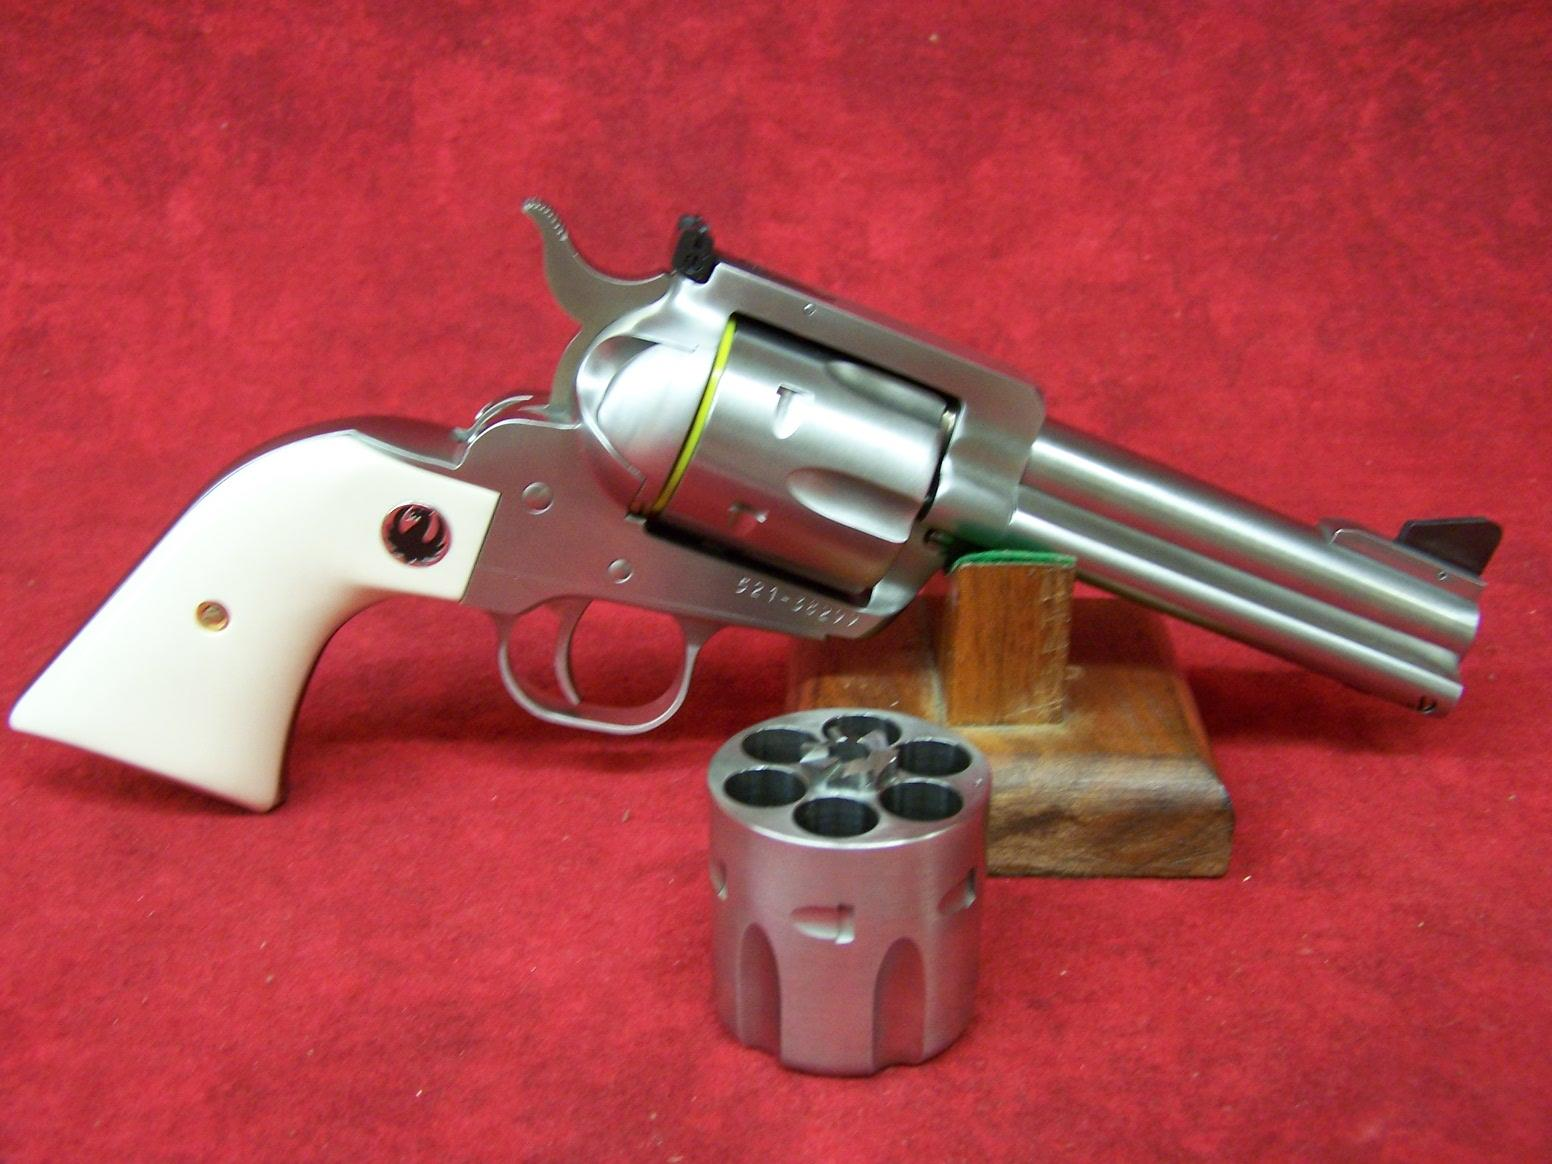 "RUGER BLACKHAWK FLATTOP 45LC/45A SS/IVORY 4-5/8""  .45 ACP (05243)  Guns > Pistols > Ruger Single Action Revolvers > Blackhawk Type"